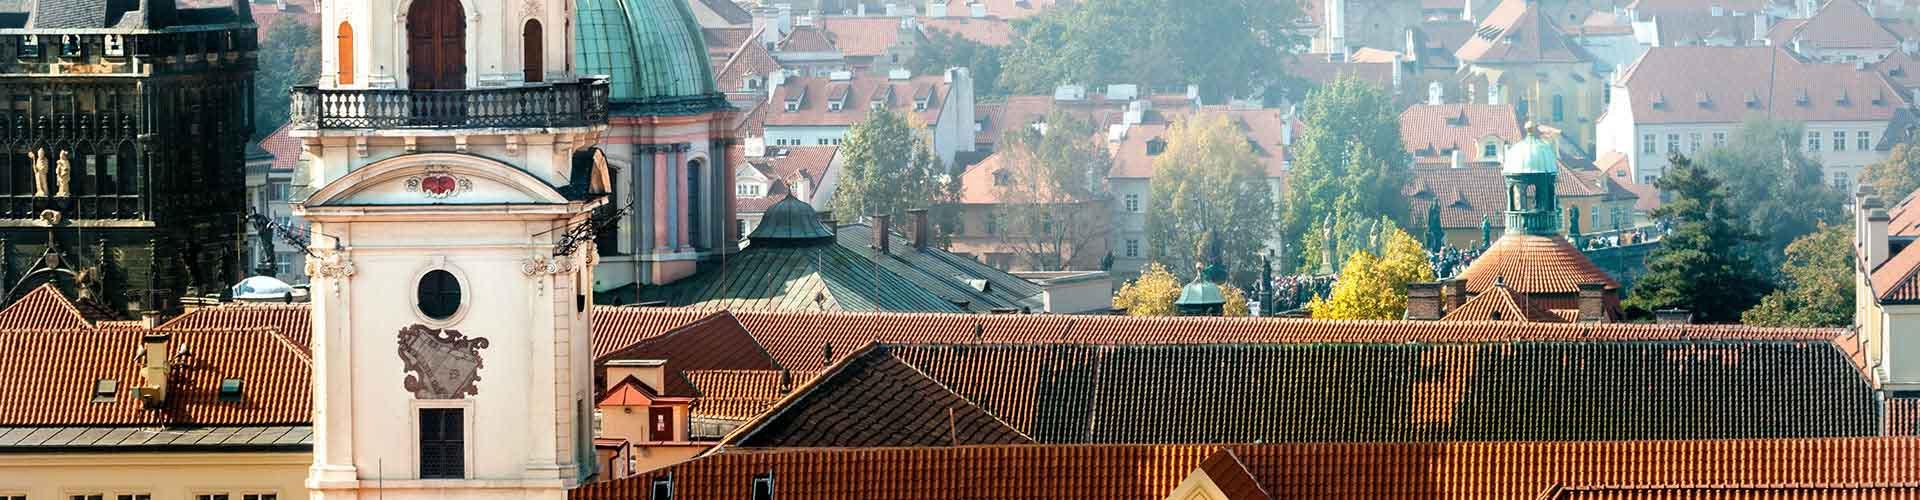 Praga - Hoteles baratos cerca a Clementinum. Mapas de Praga, Fotos y comentarios de cada Hotel en Praga.